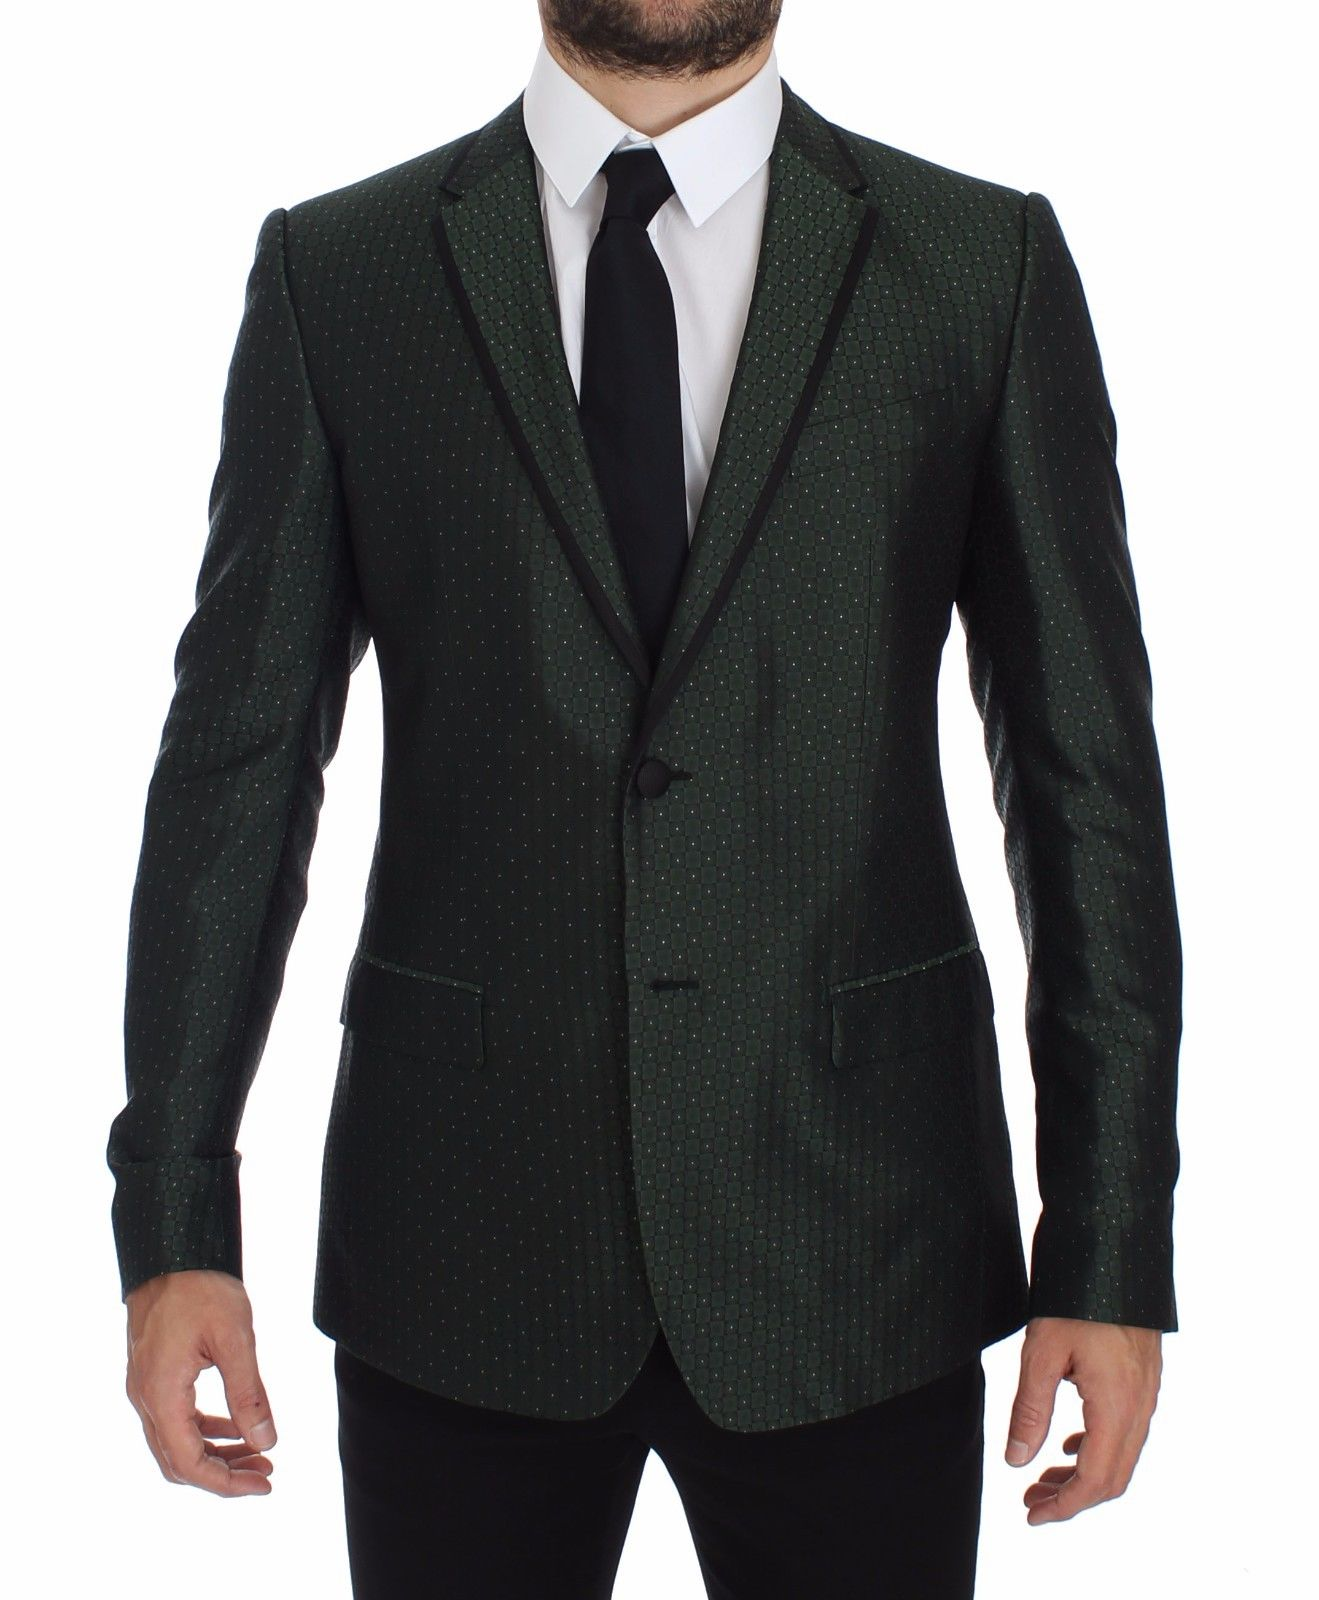 Dolce & Gabbana Men's Slim Fit Silk Two Button Blazer Green GTT10088 - IT44   XS